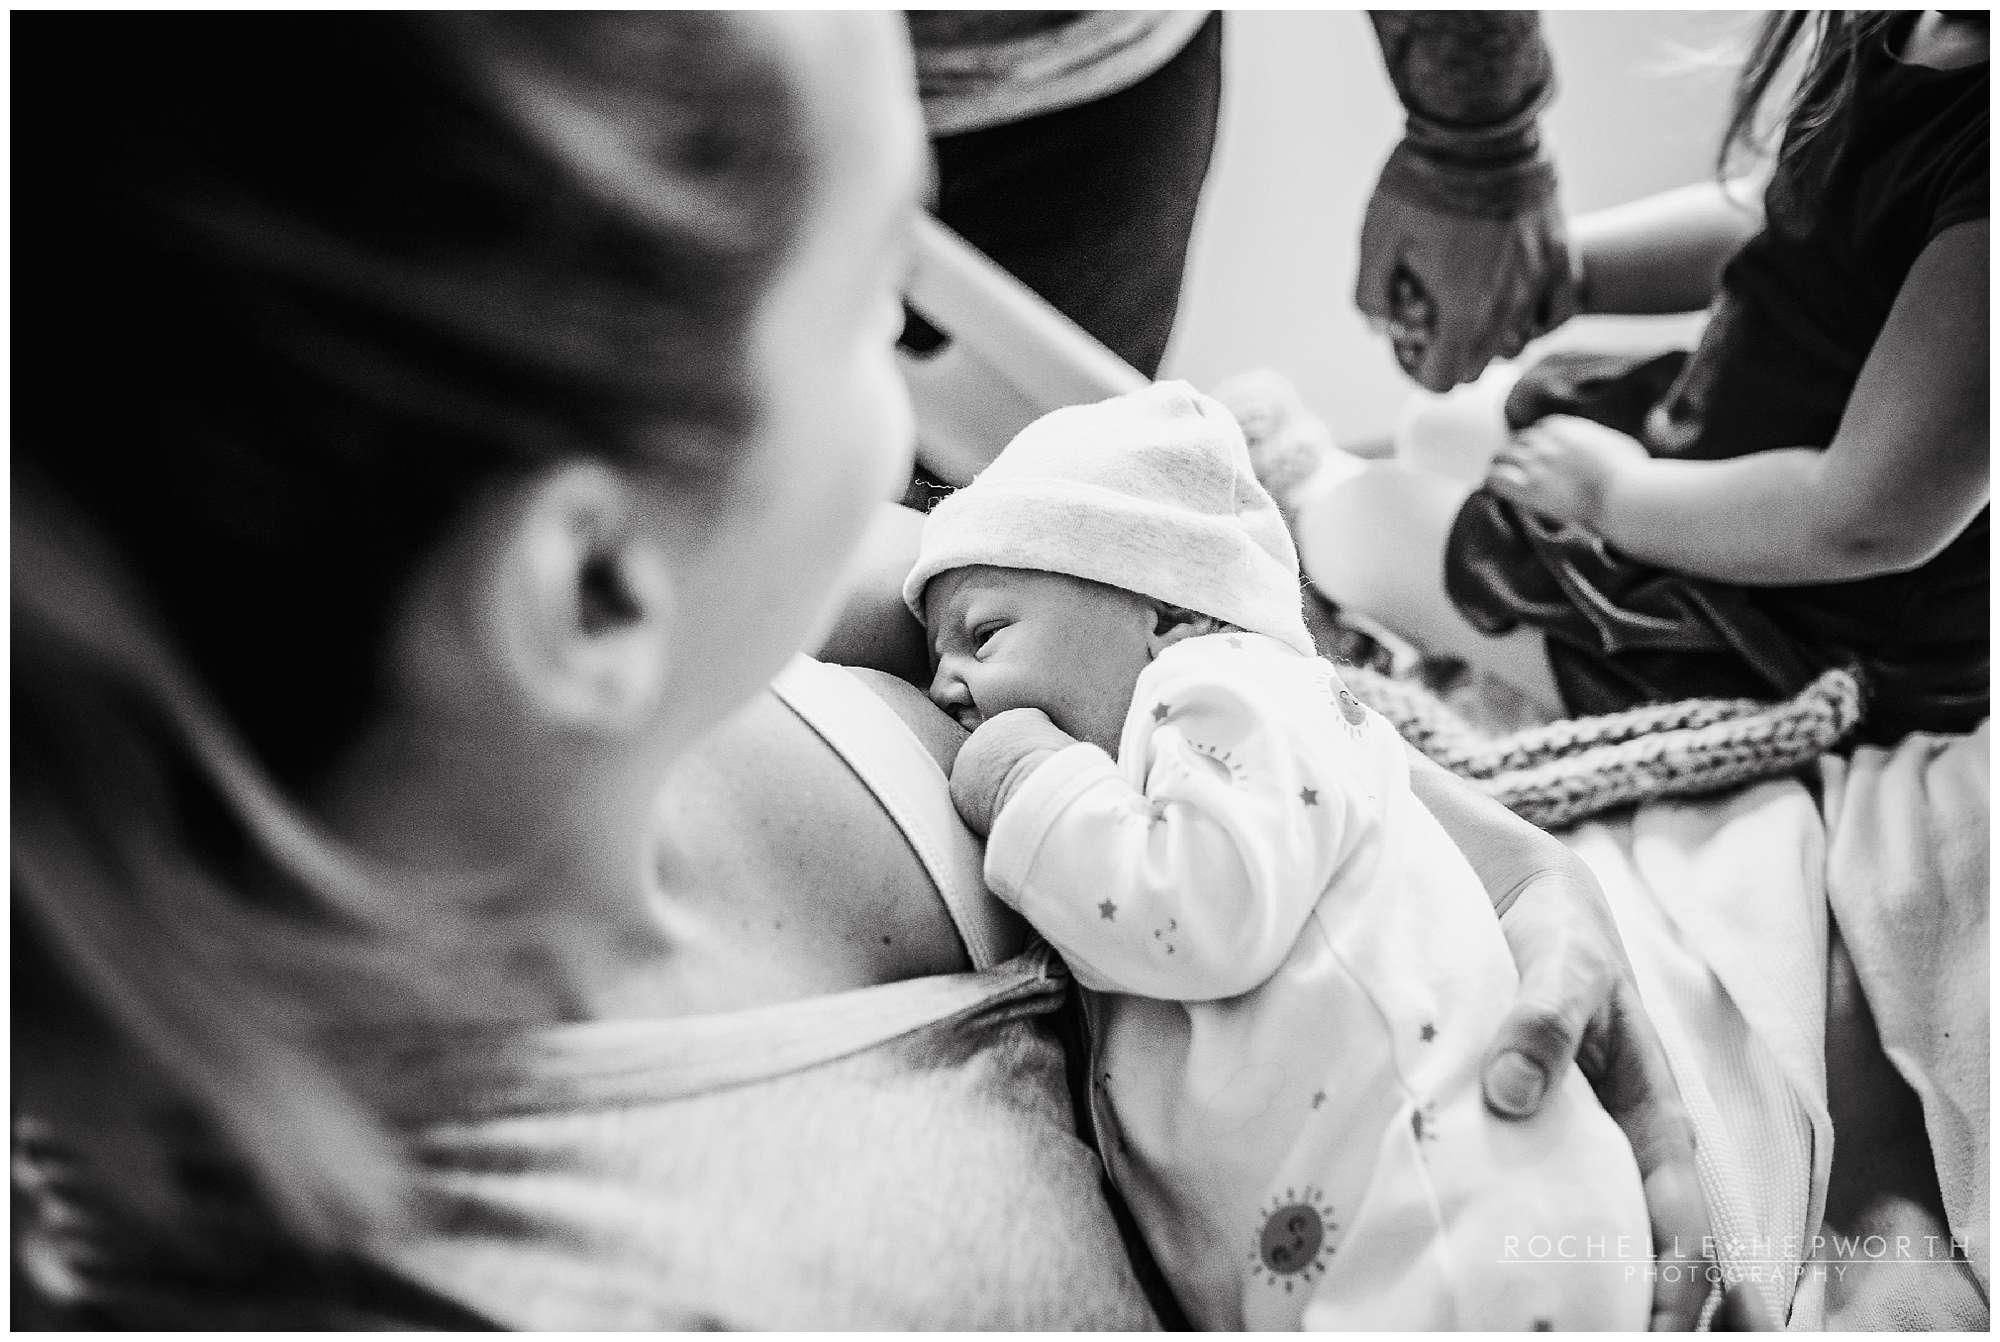 black and white photo of mom breastfeeding newborn baby